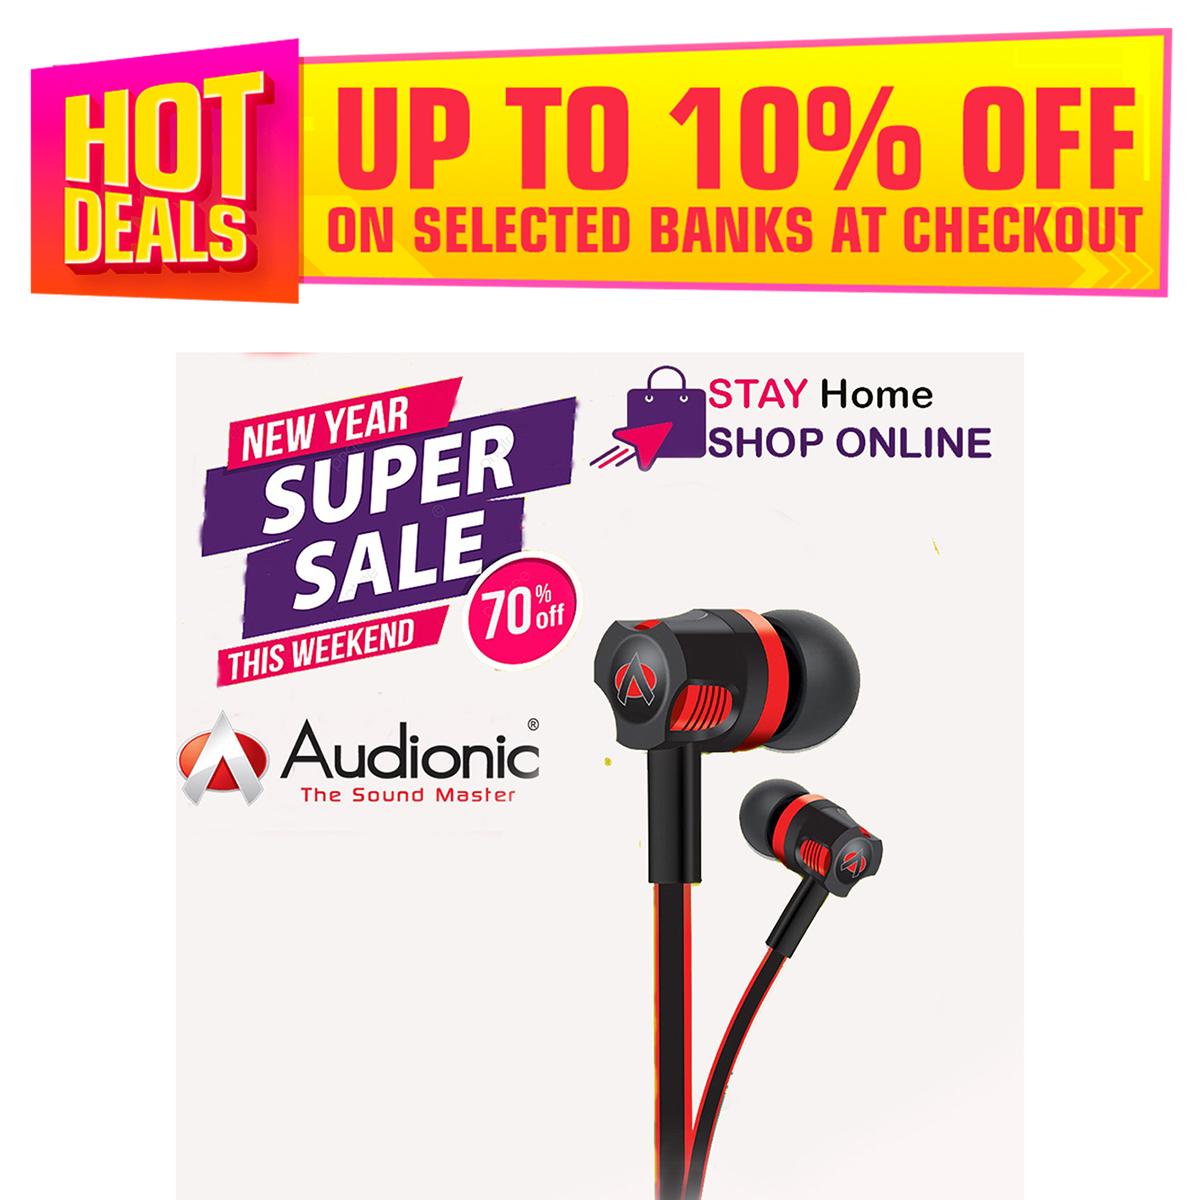 Audionic t50 handfree thunder sound Super Bass Stereo Sound earphone + Hand free for Huawei \Samsung Handfree